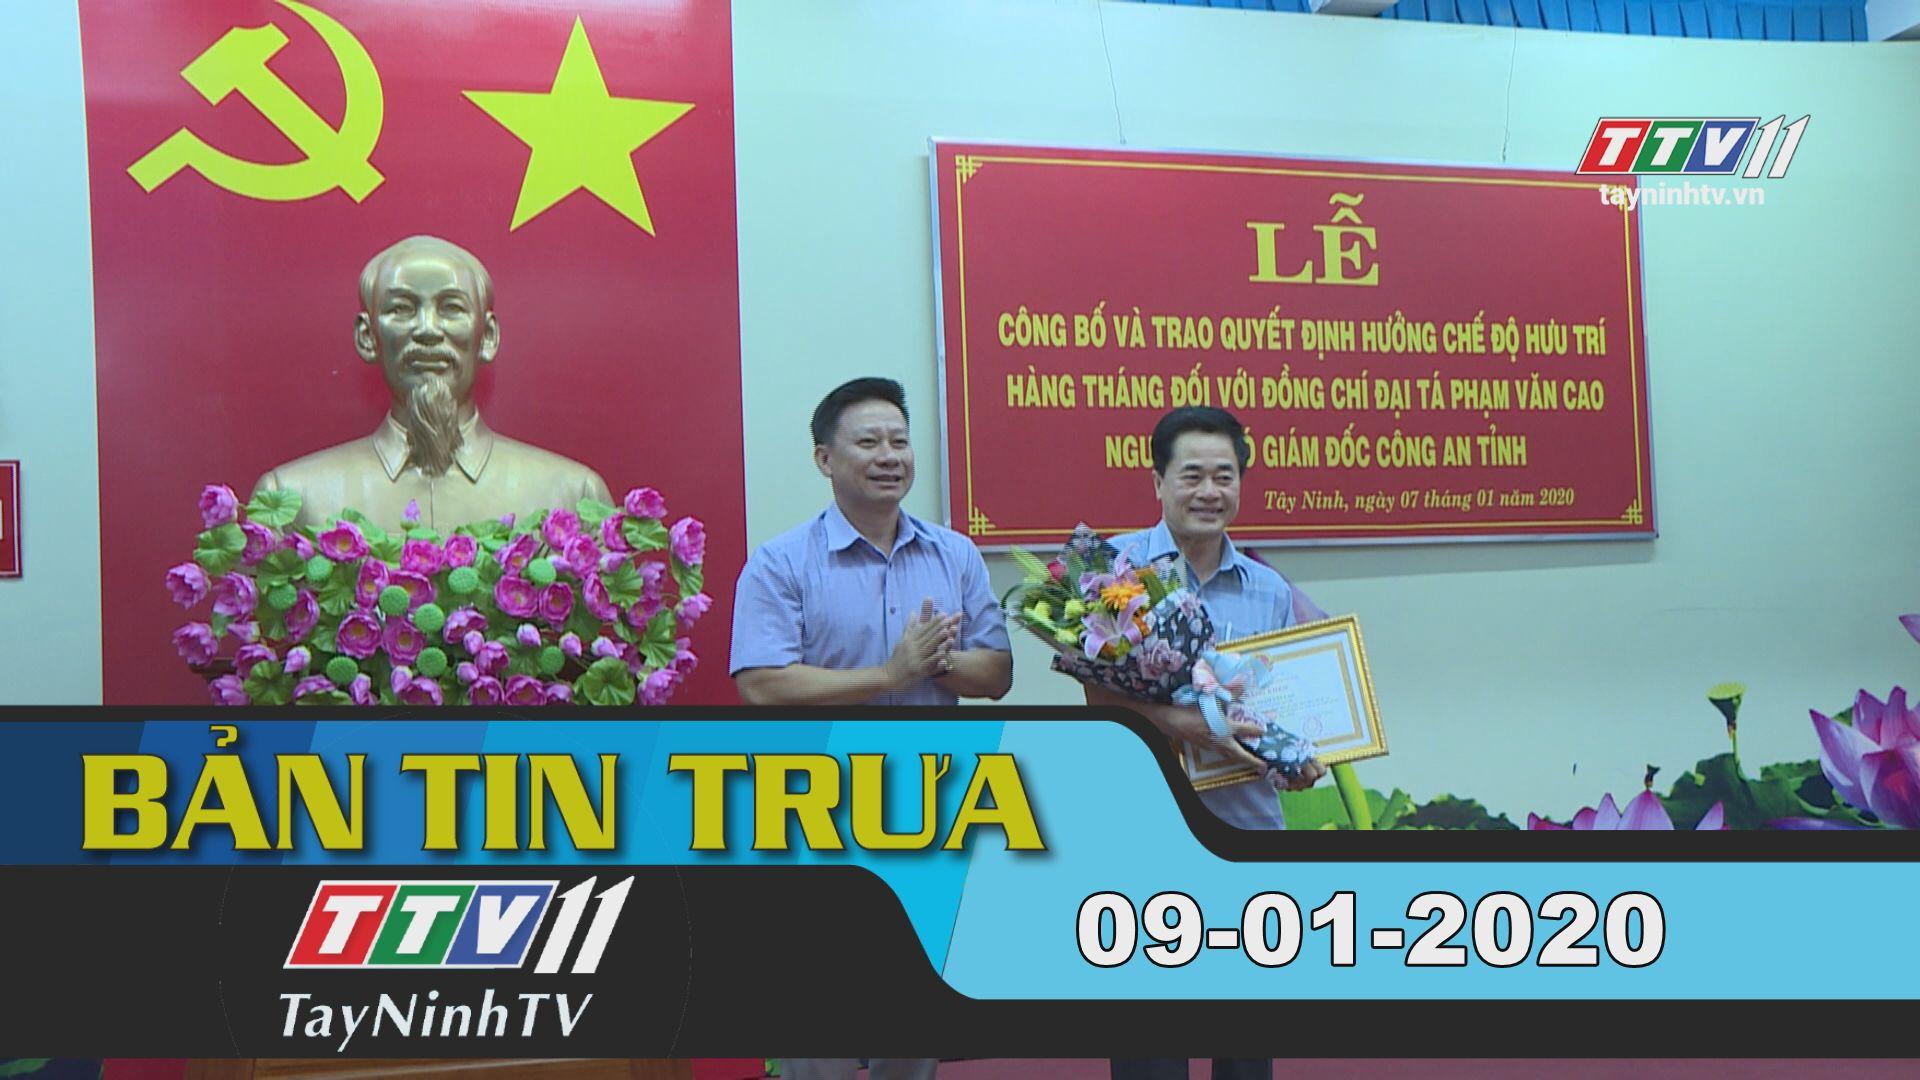 Bản tin trưa 09-01-2020 | Tin tức hôm nay | TayNinhTV